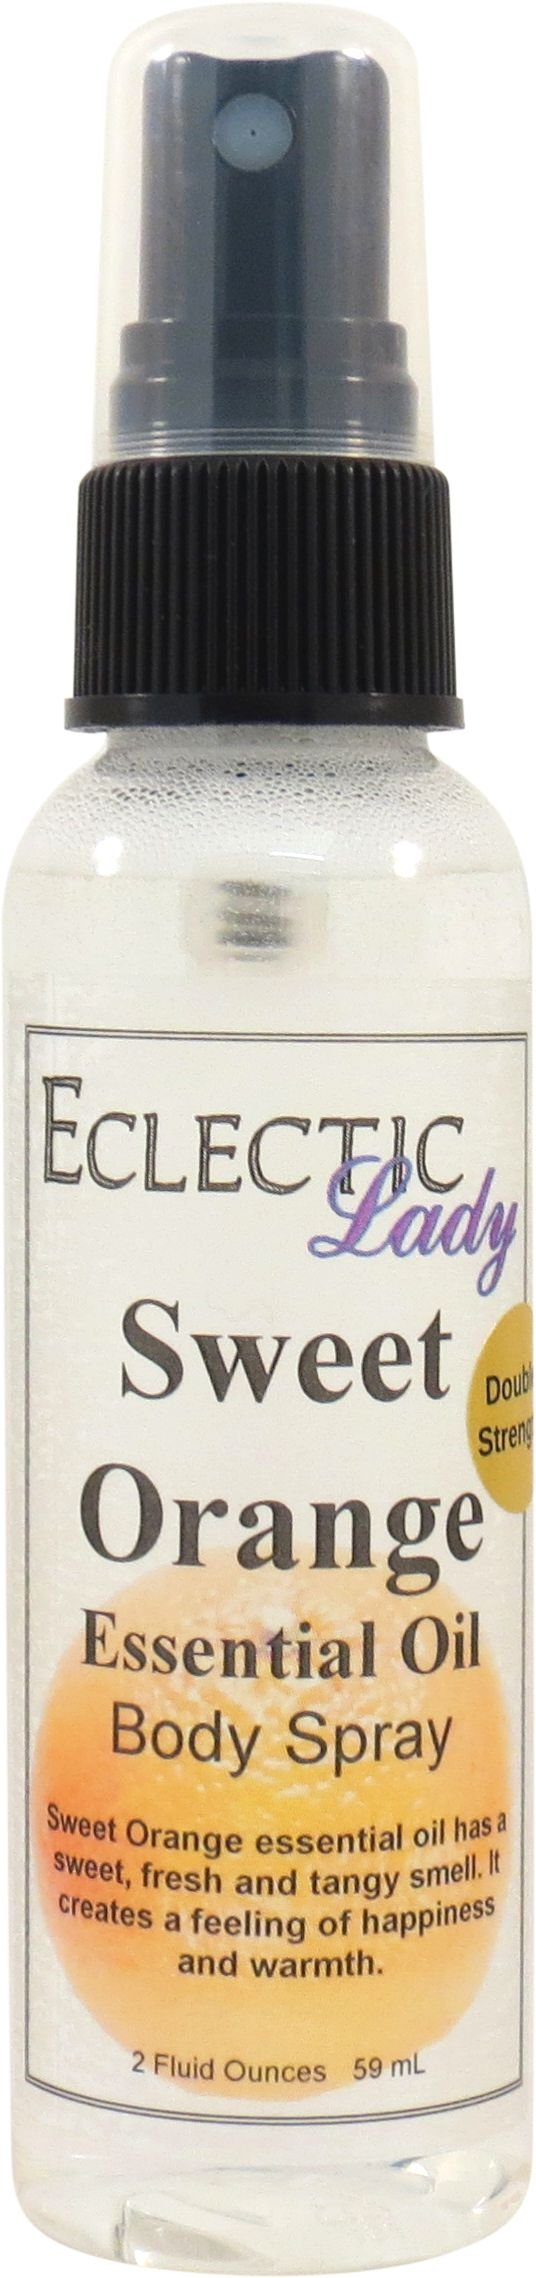 Sweet Orange Essential Oil Body Spray (Double Strength), 2 ounces